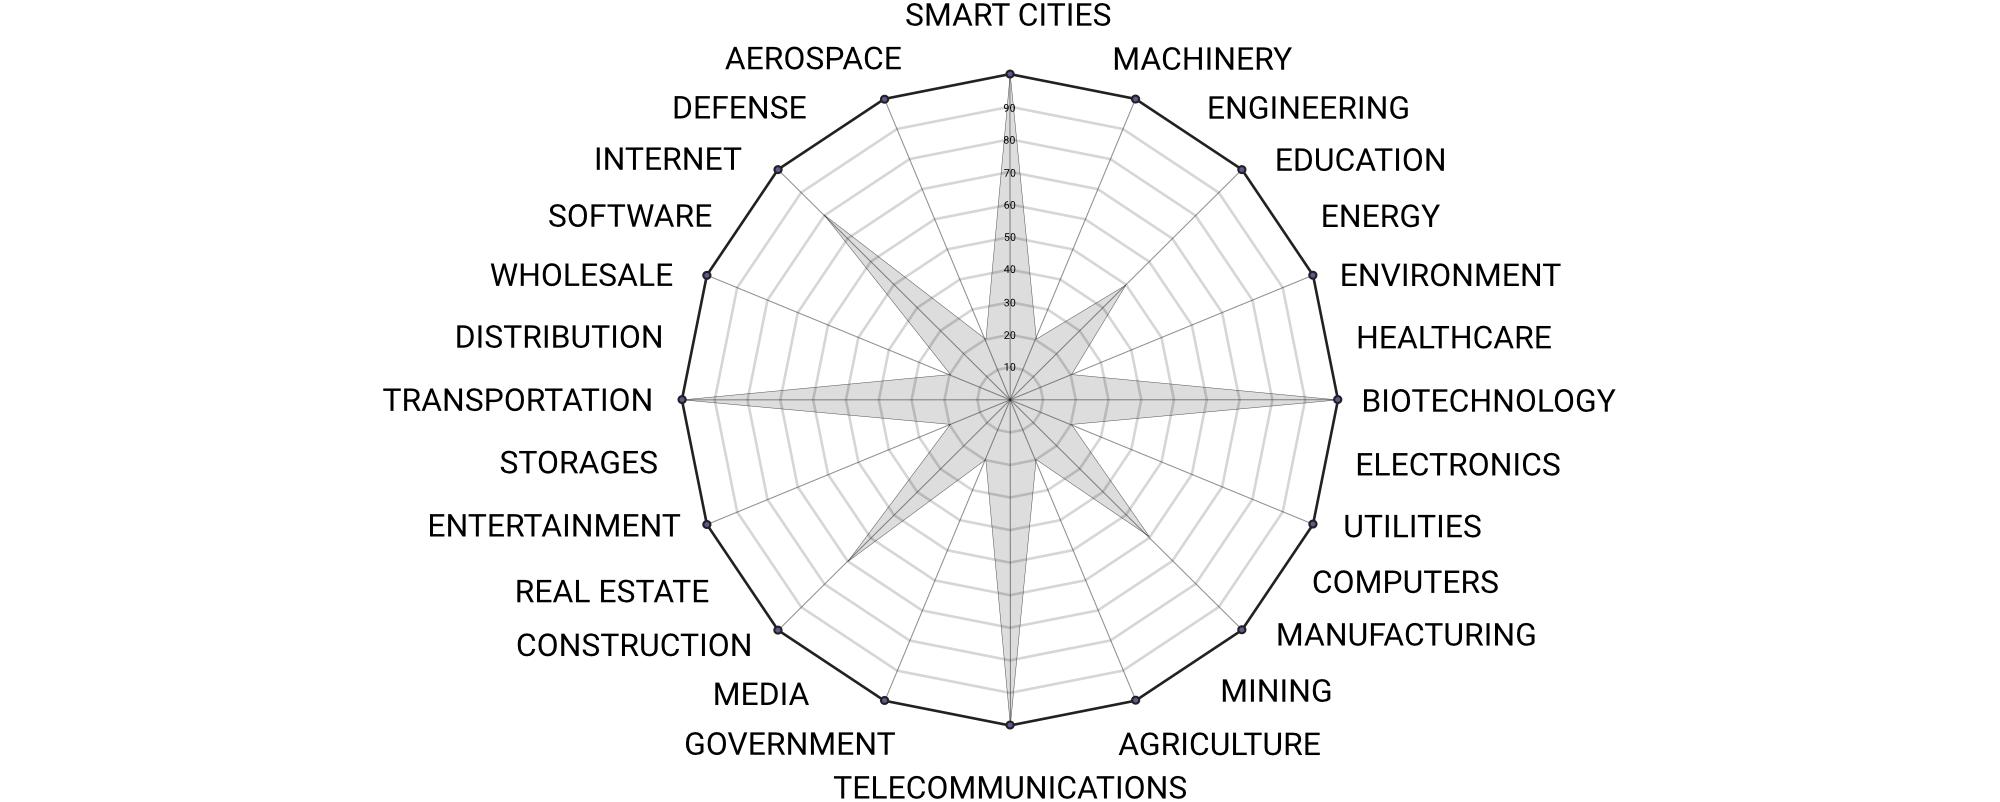 smart city tenders business industries cities procurement tenders smart city enterprise now